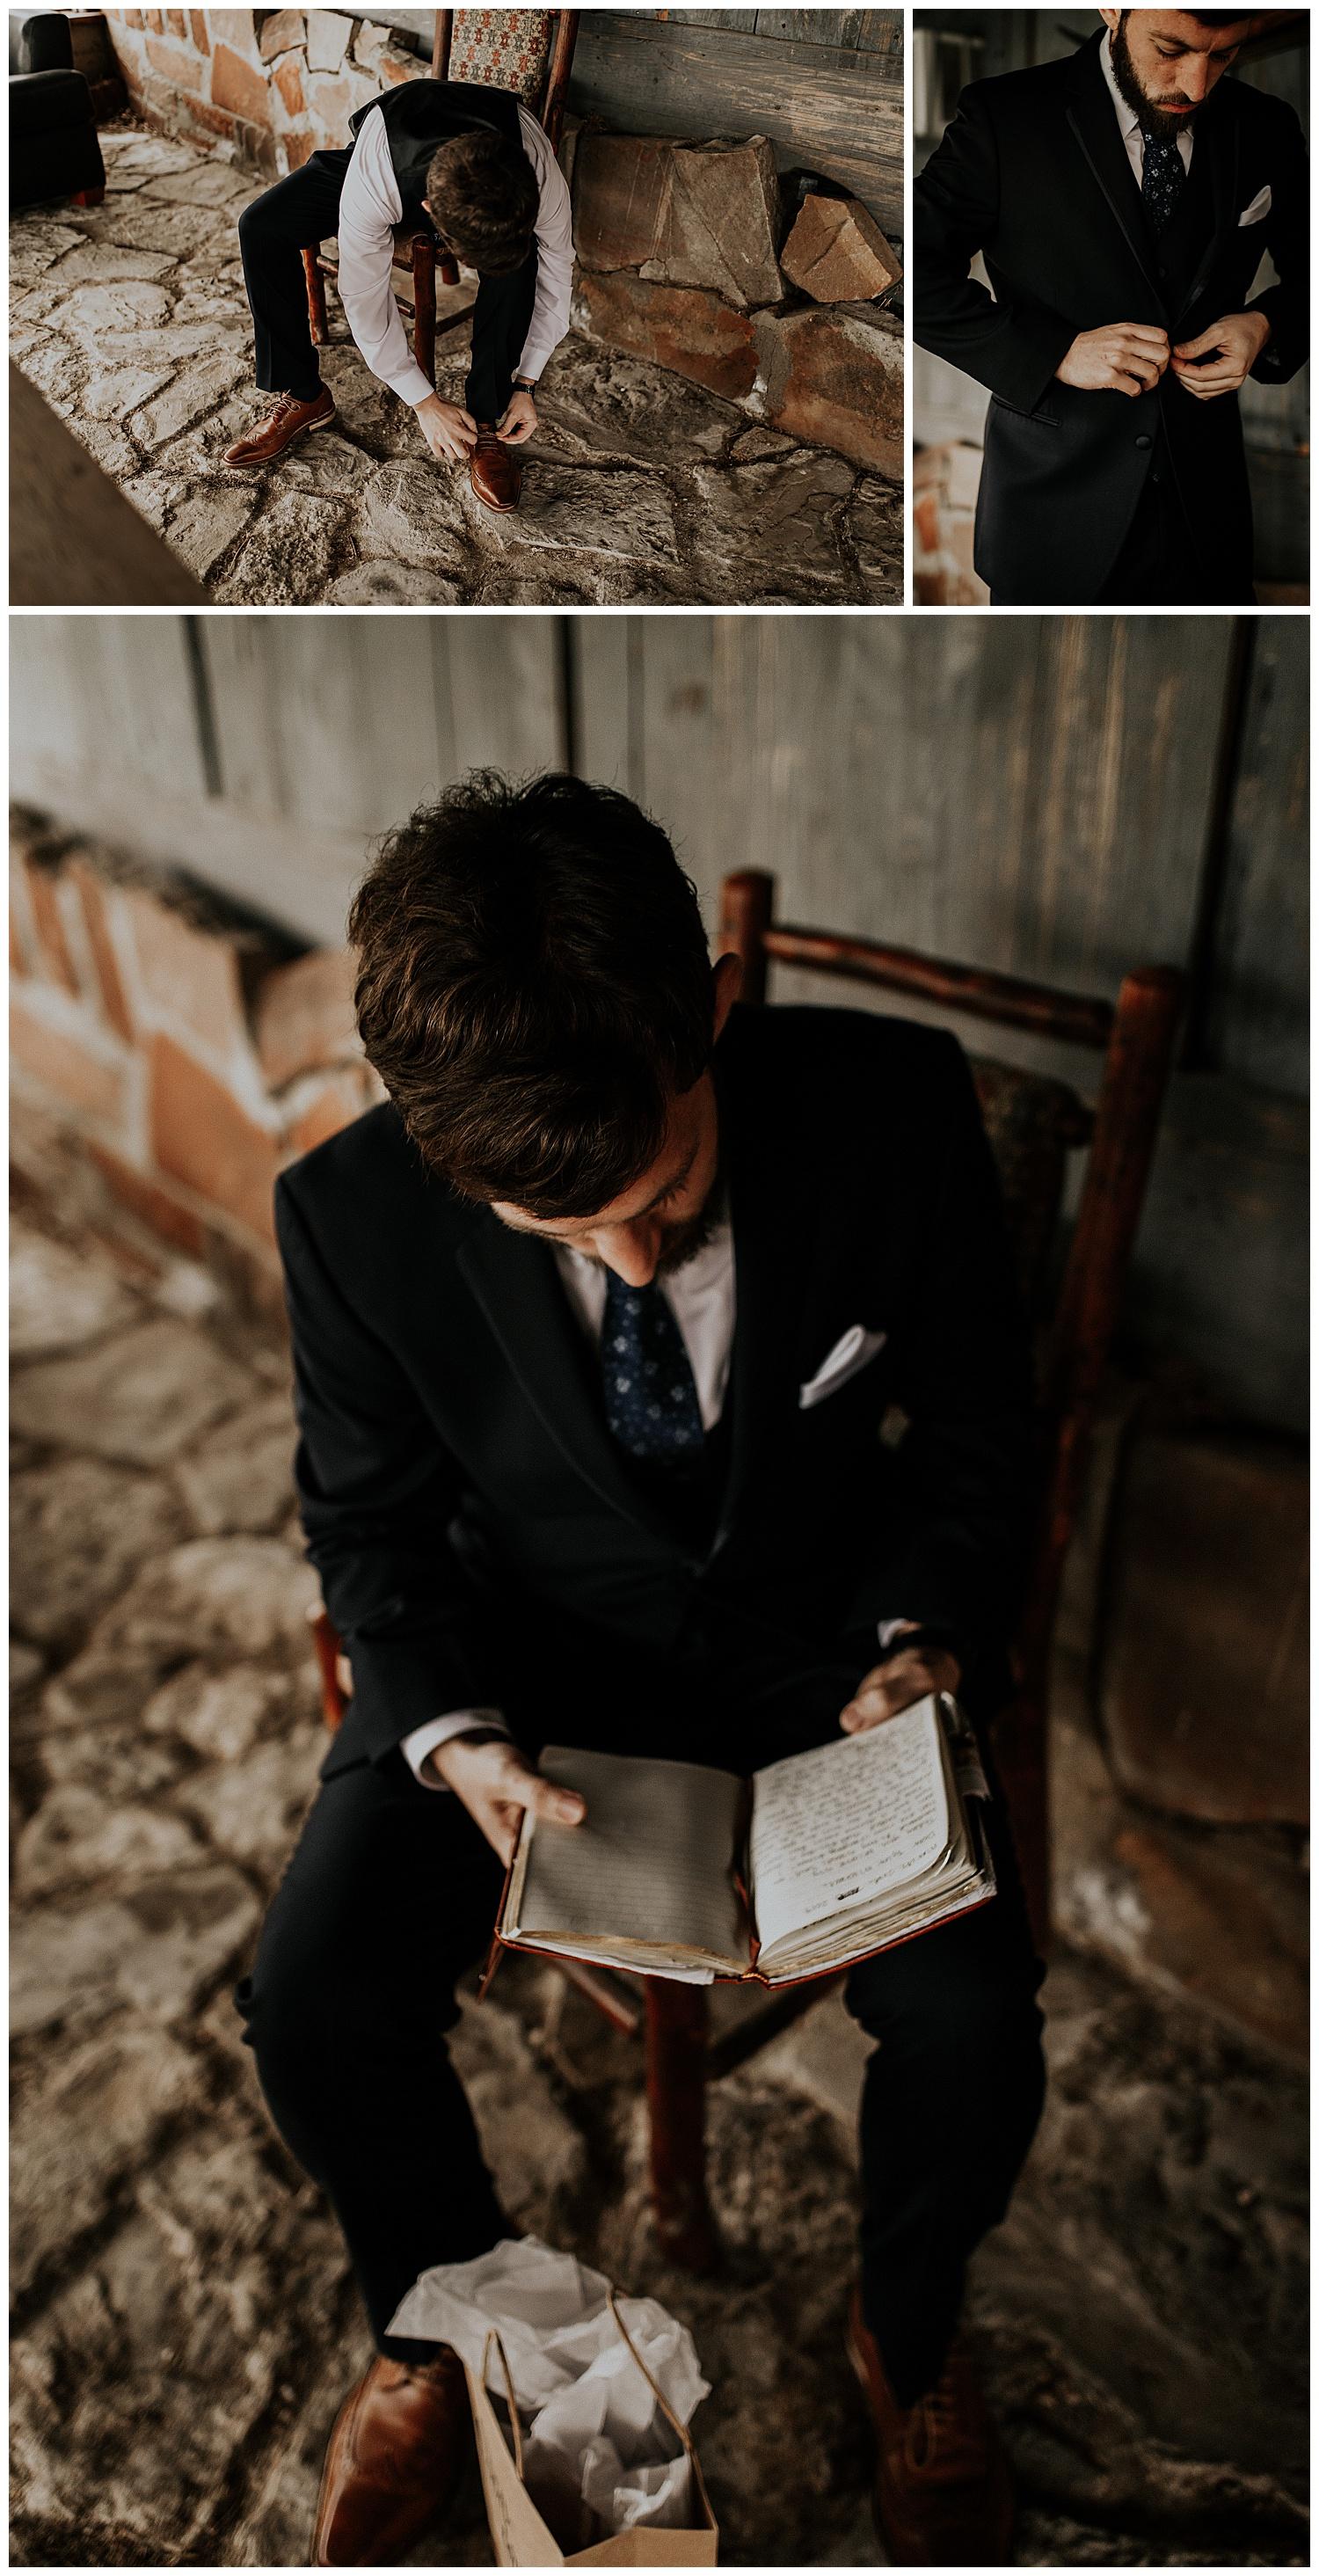 Laken-Mackenzie-Photography-Burge-Wedding-Stillwater-Meadow-Aledo-Texas-Dallas-Fort-Worth-Wedding-Photographer05.jpg